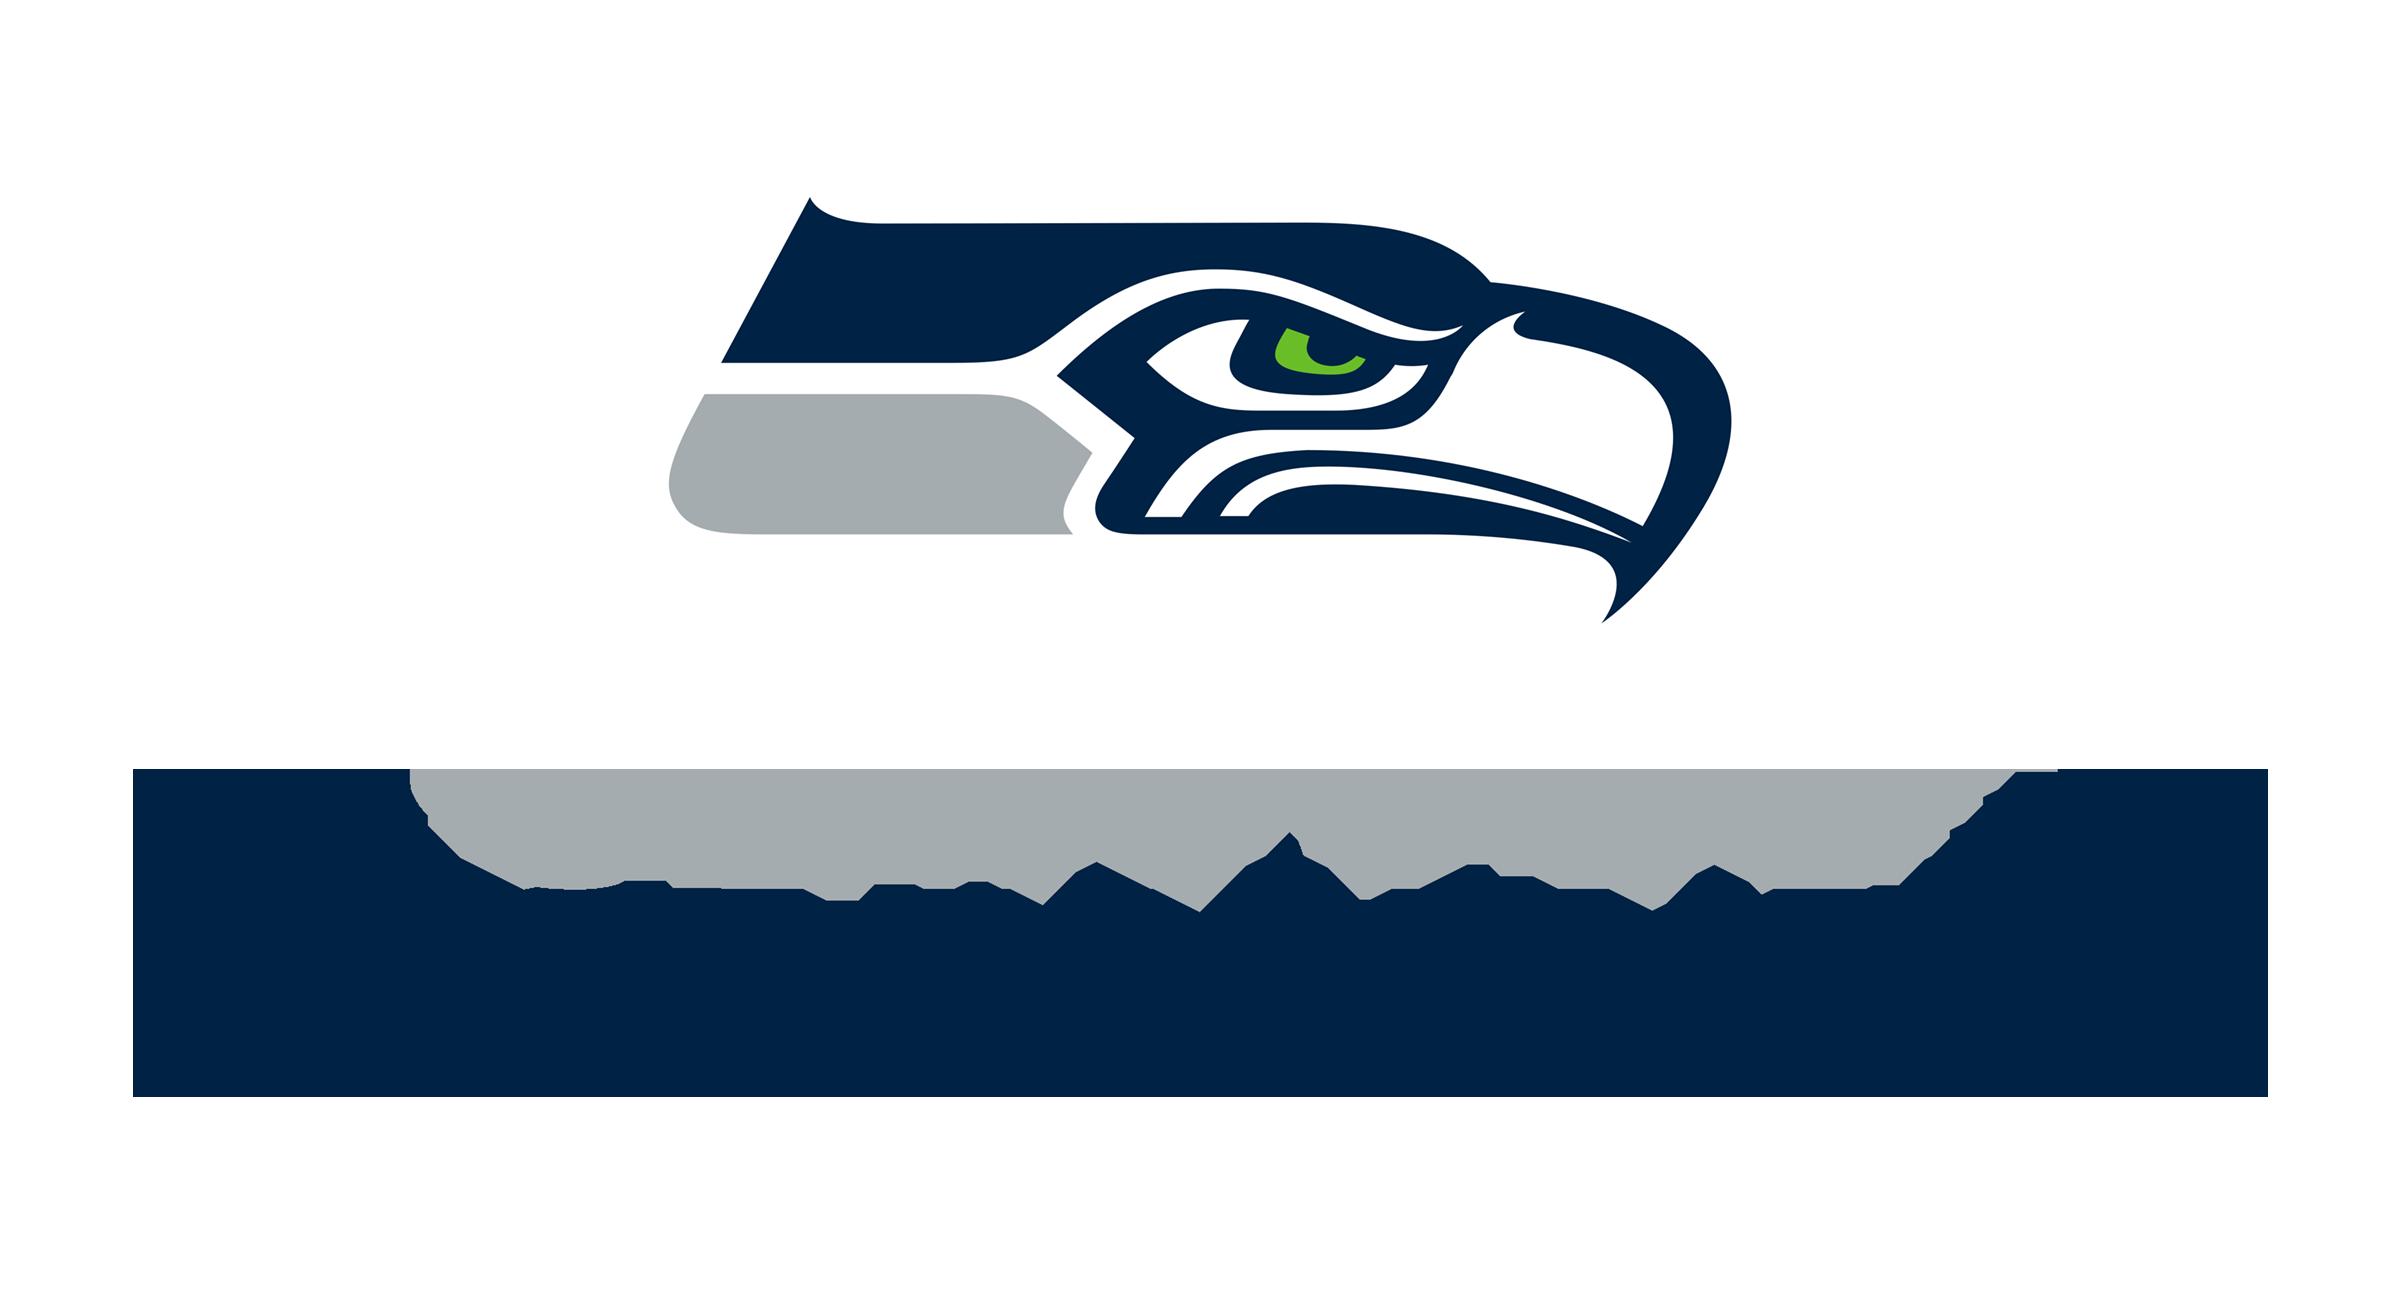 Seattle Seahawks Logo PNG Transparent & SVG Vector.